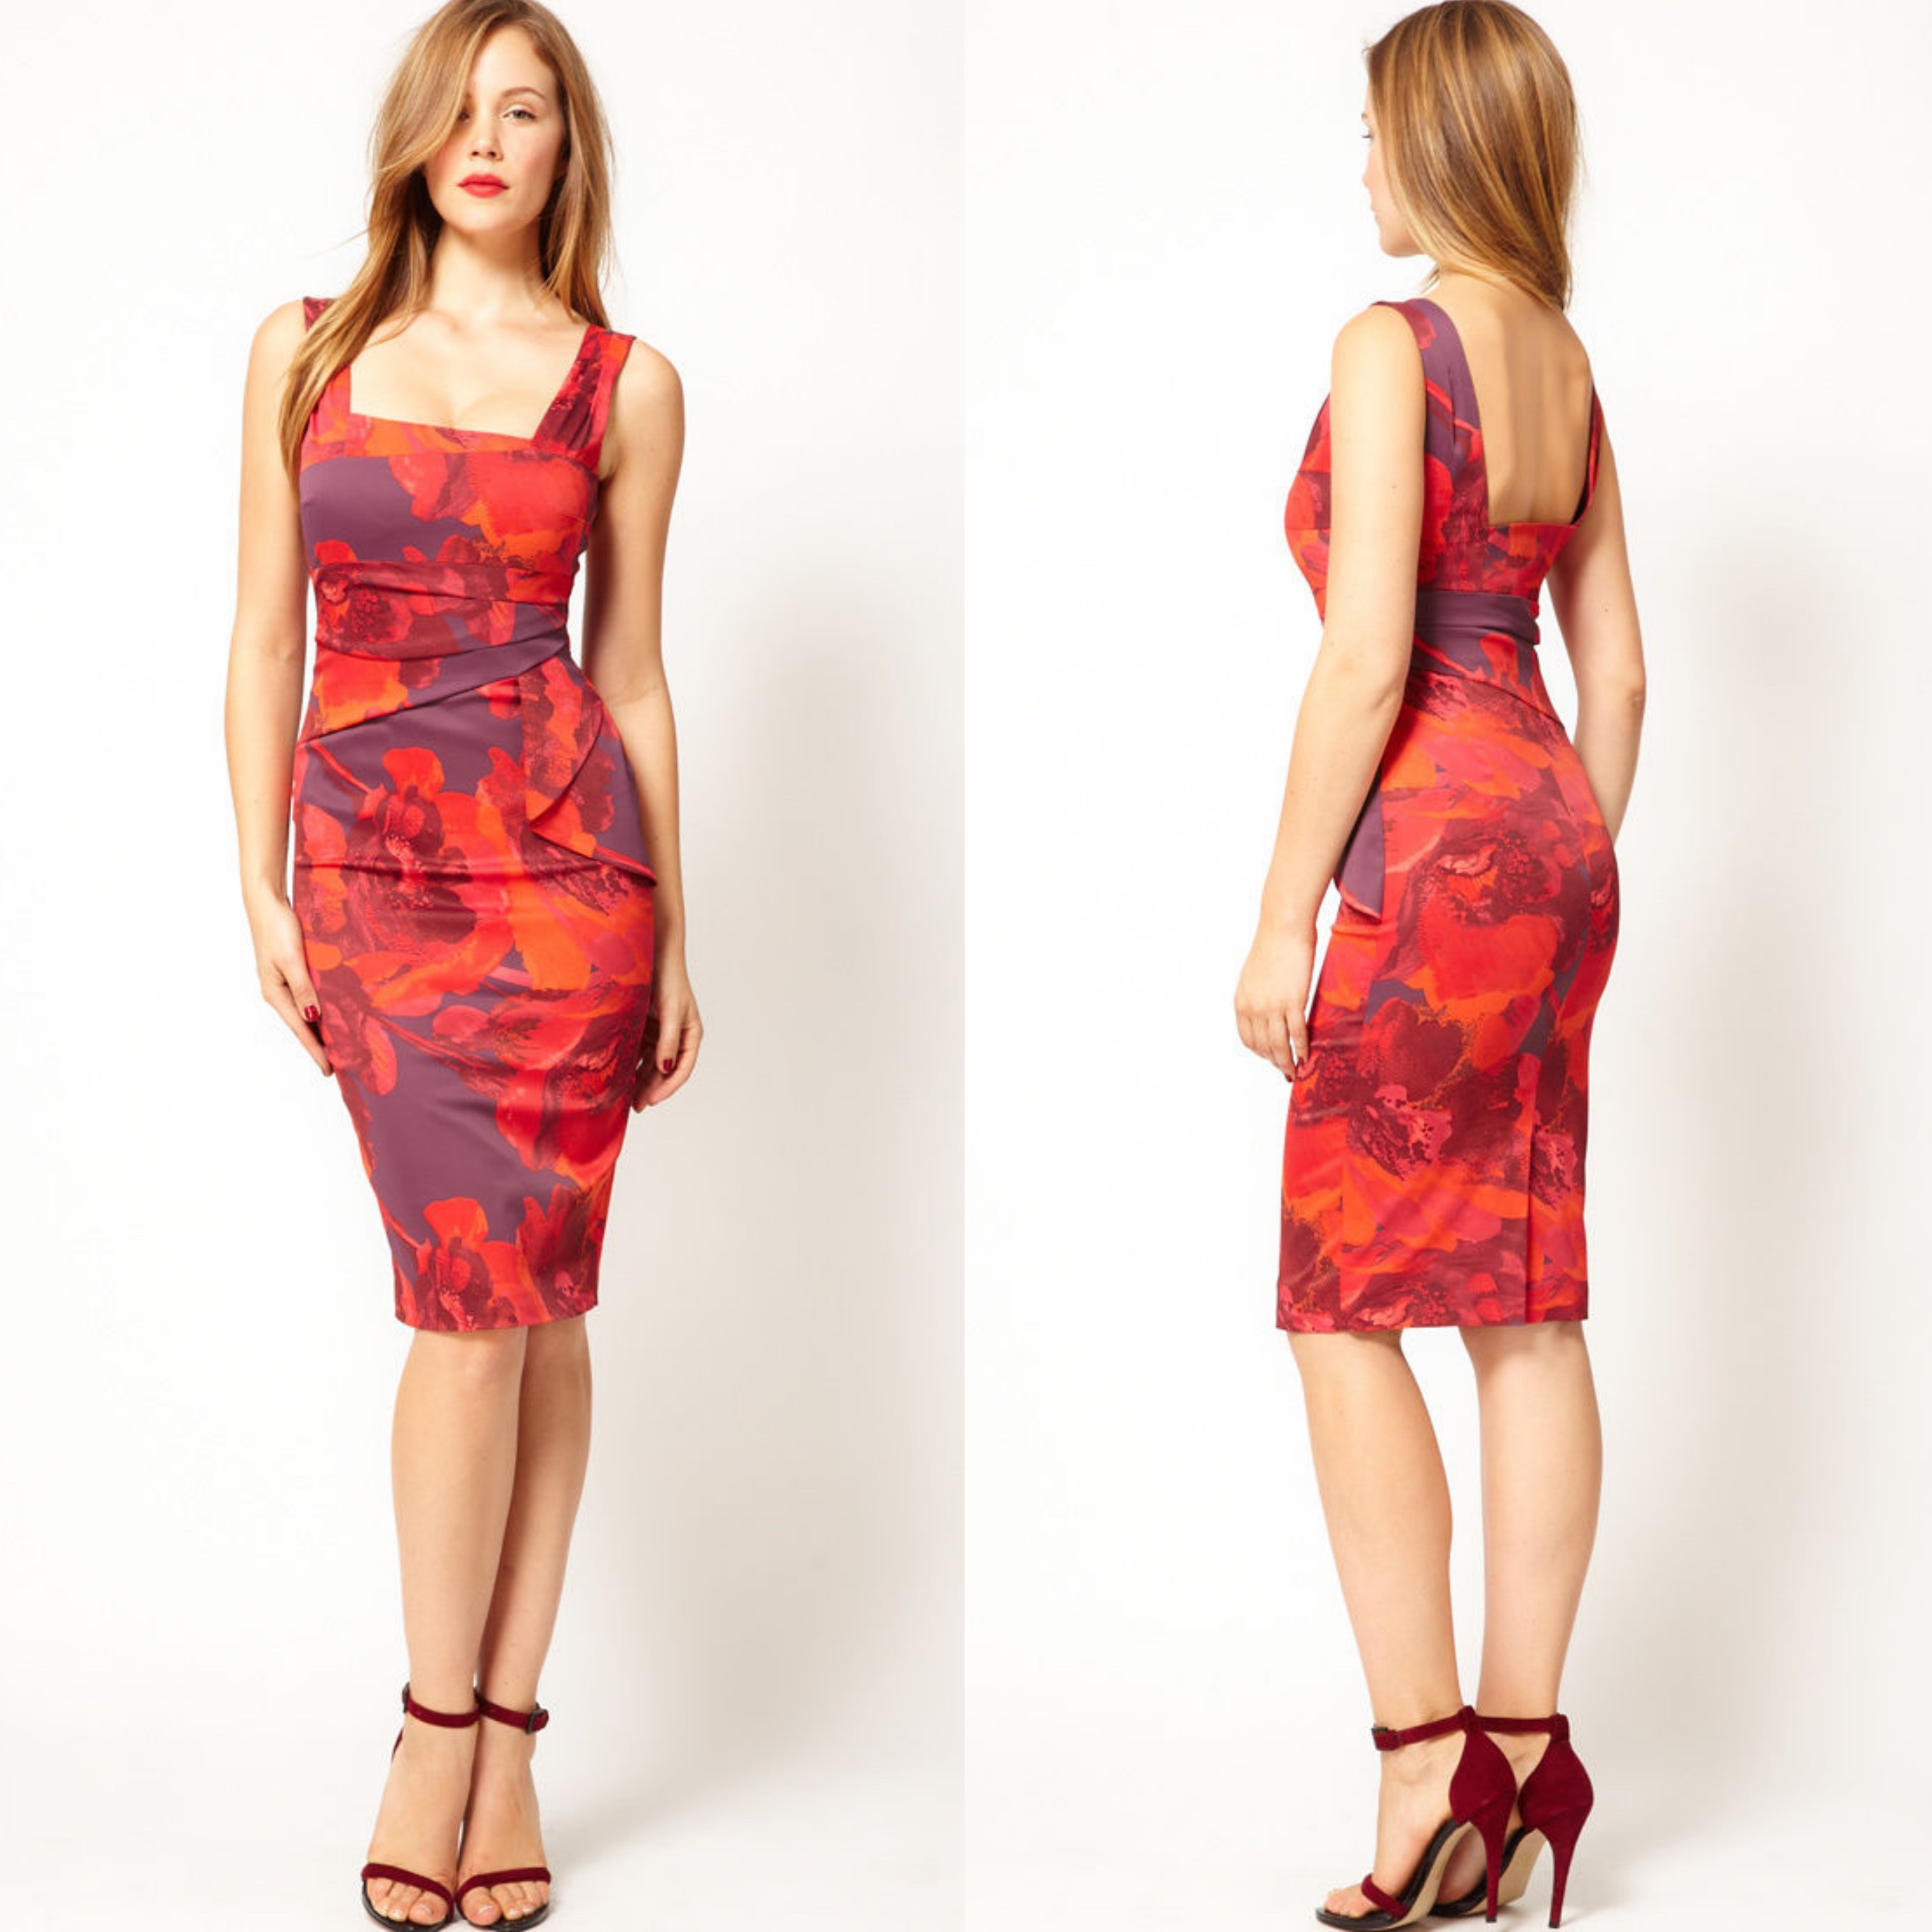 New Karen Millen Dress Floral Print Satin Bodycon Pencil Red Purple ...